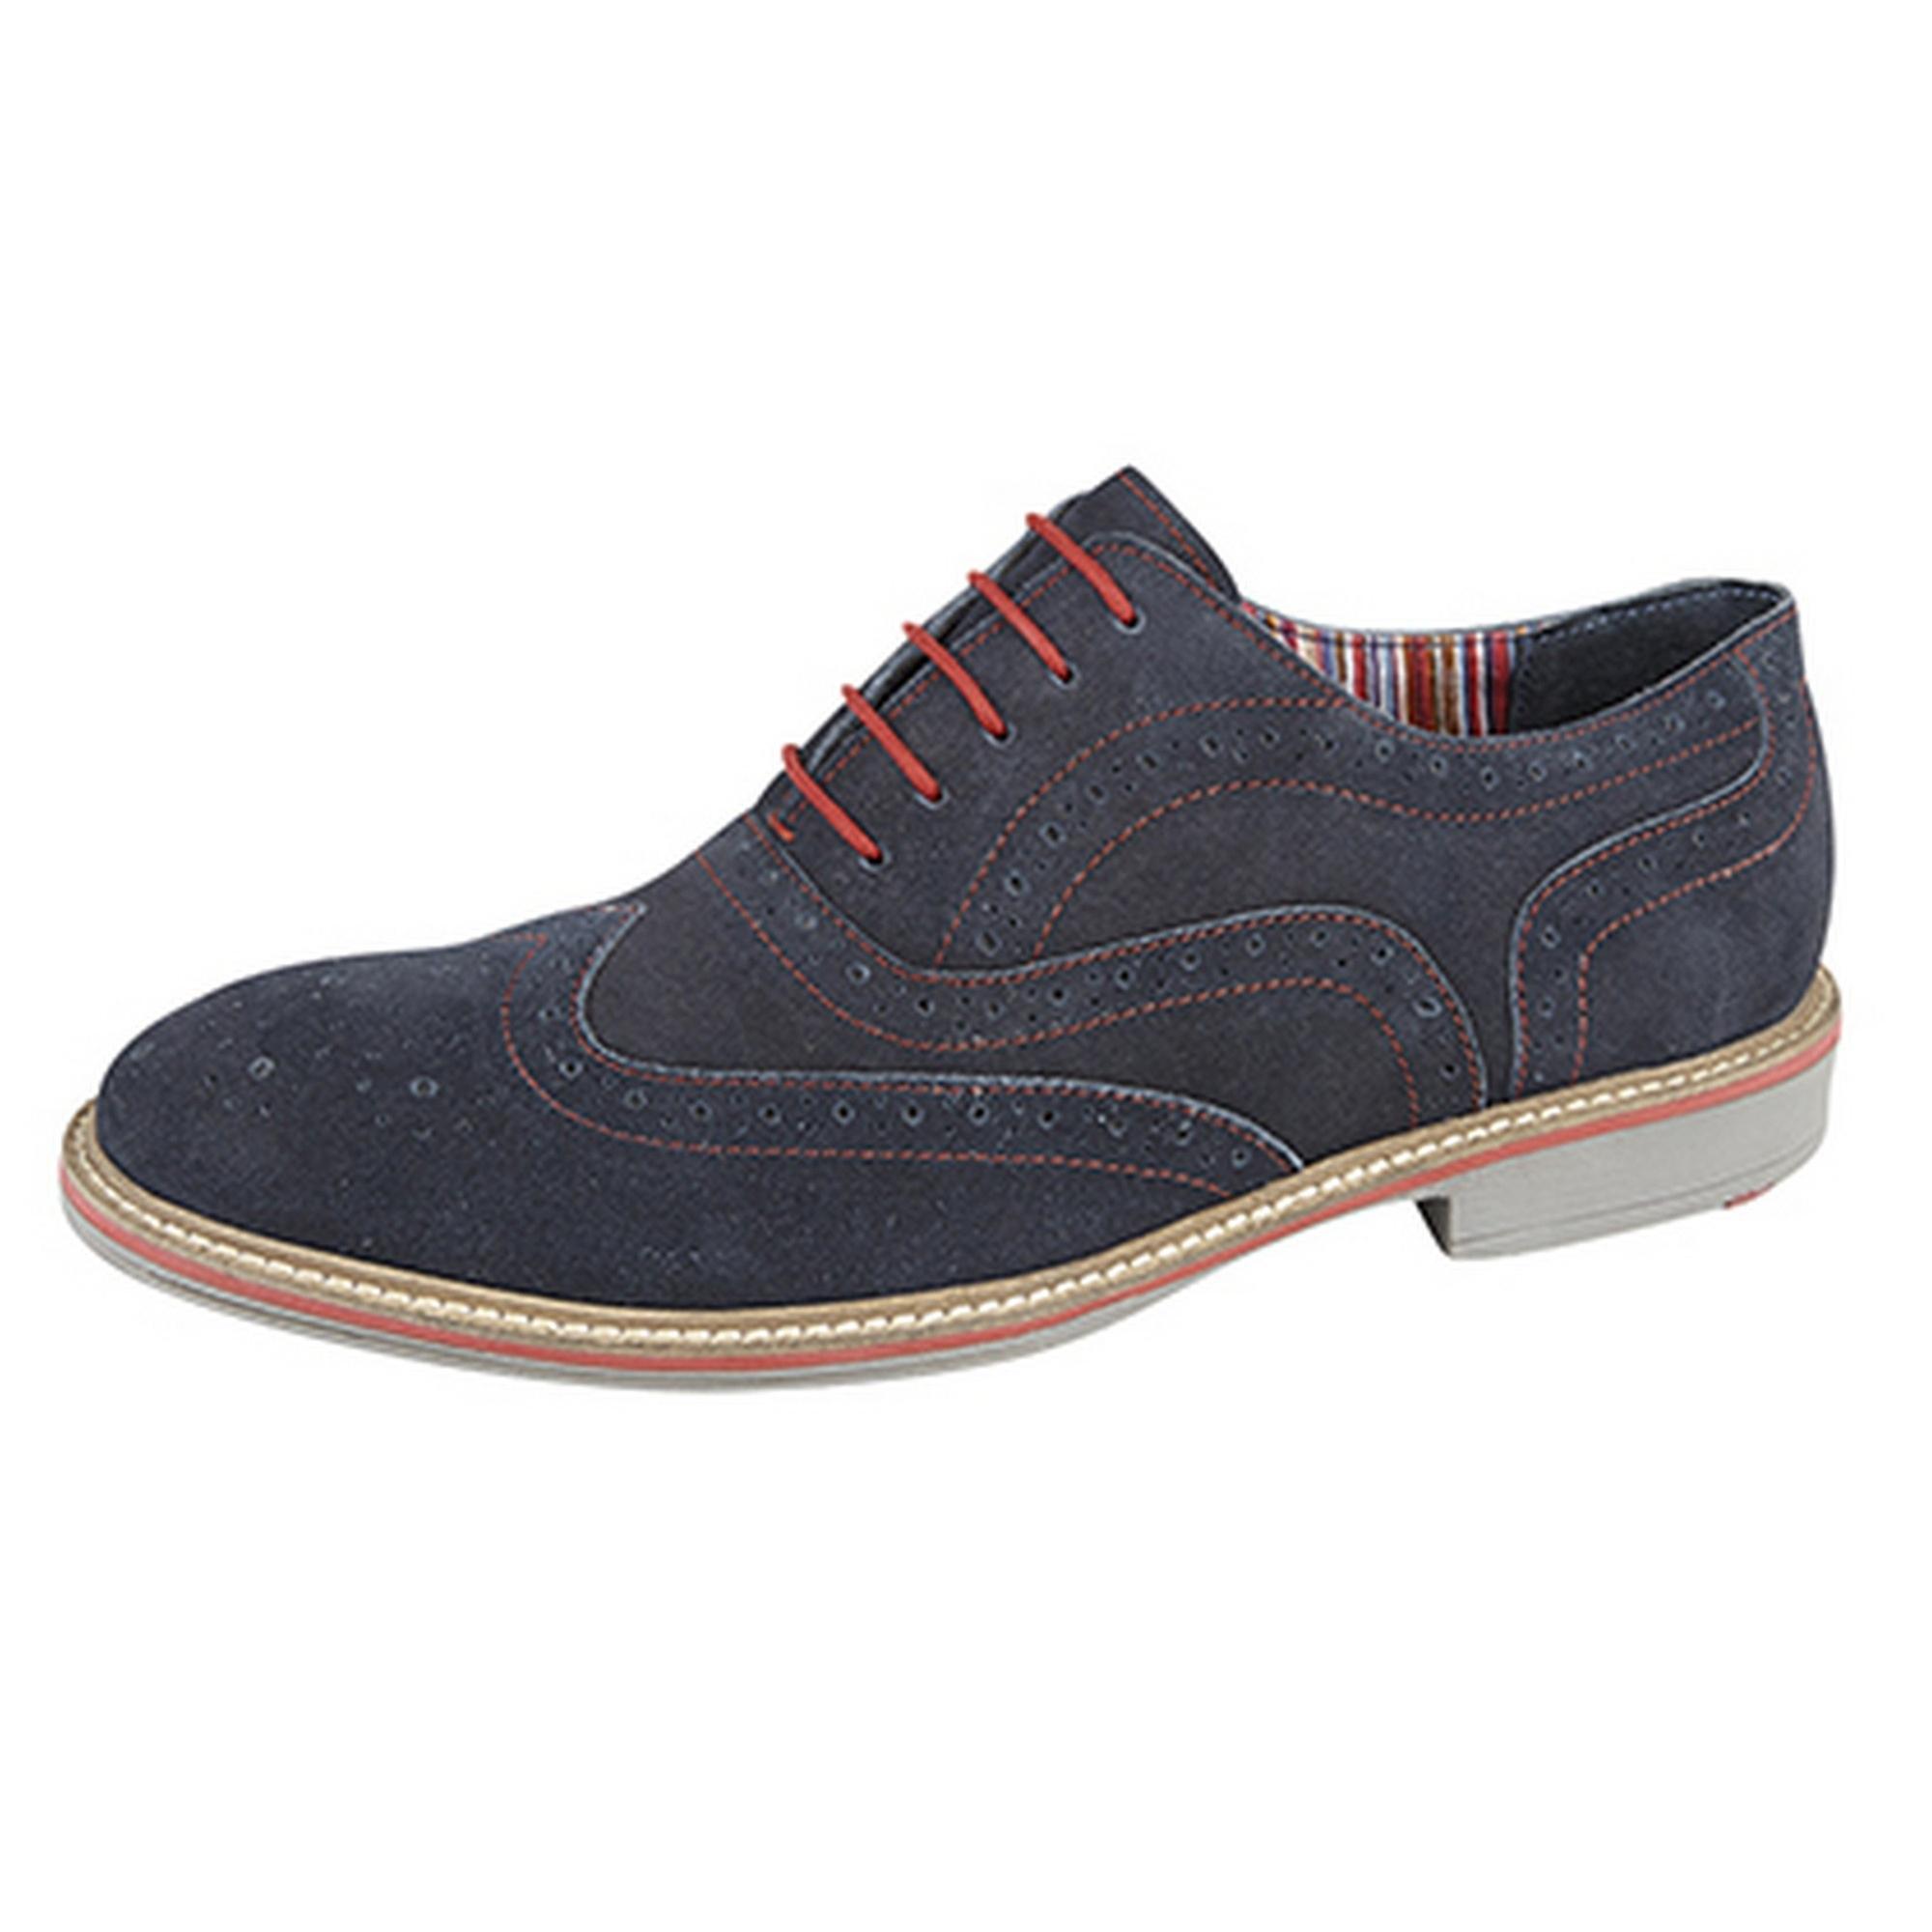 Roamers Mens 5 Eye Oxford Brogue Shoes